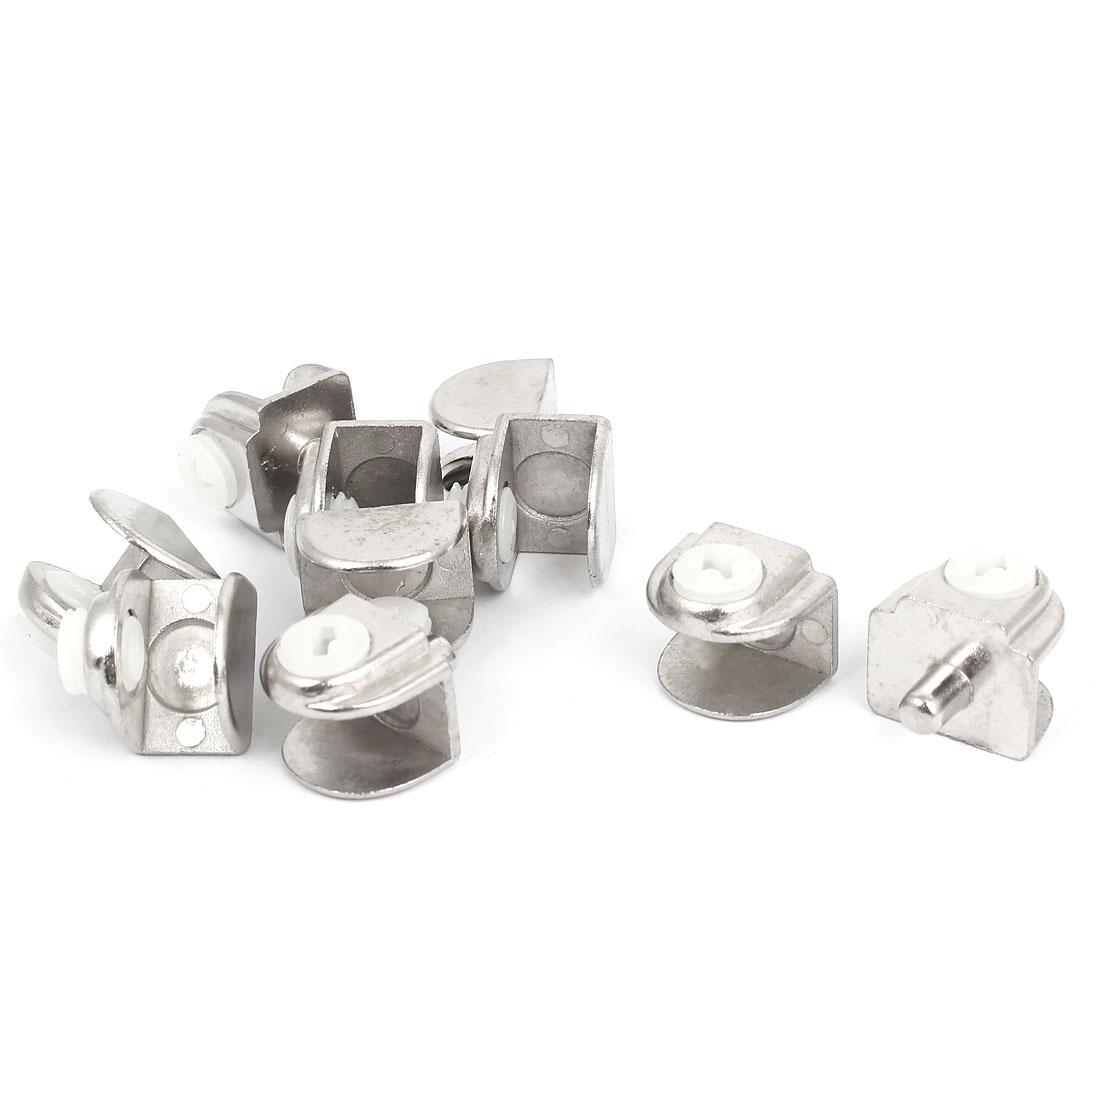 10pcs 7-9mm Thickness Metal Adjustable Door Hinge Glass Clamp Clip Support Bracket